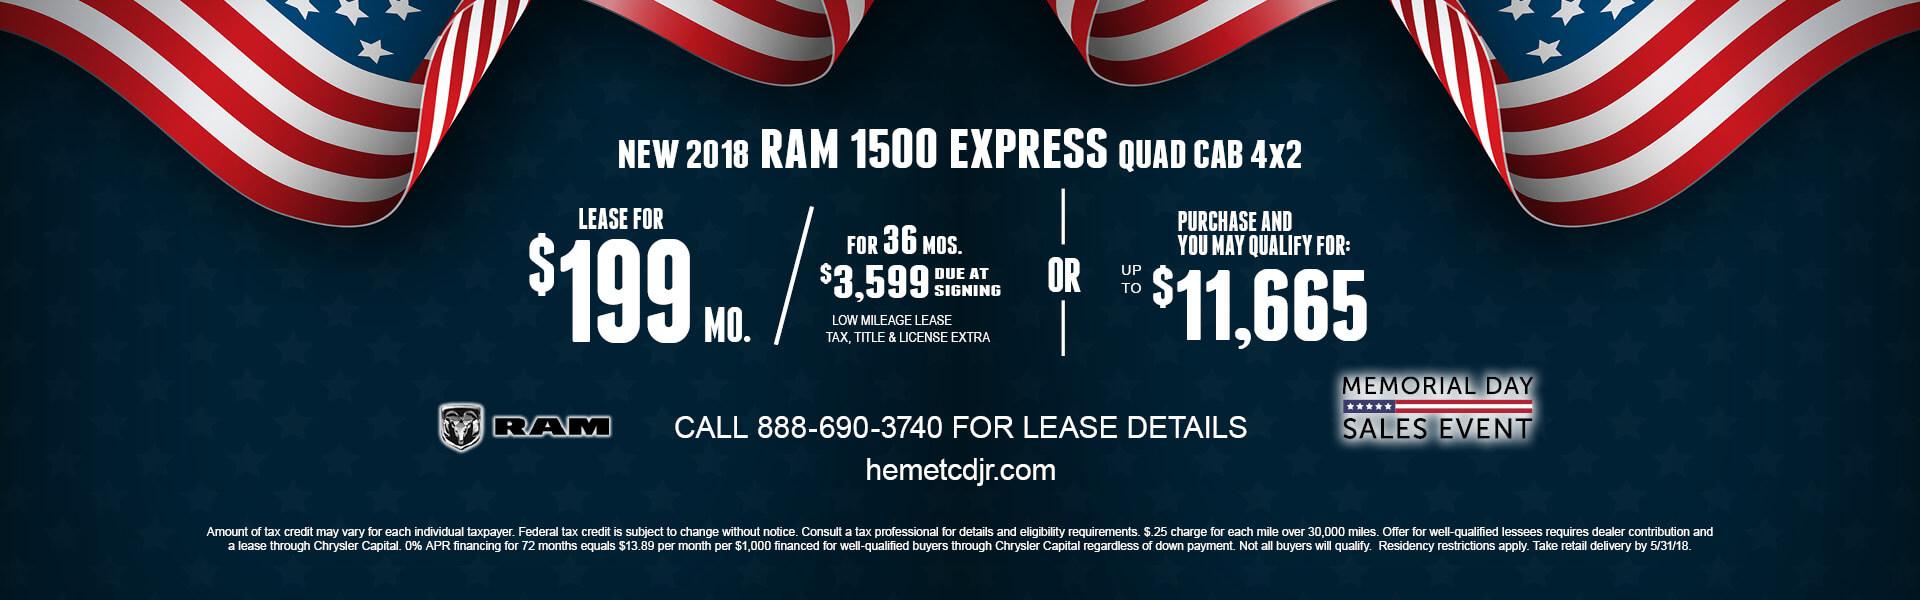 Ram 1500 Express $199 Lease